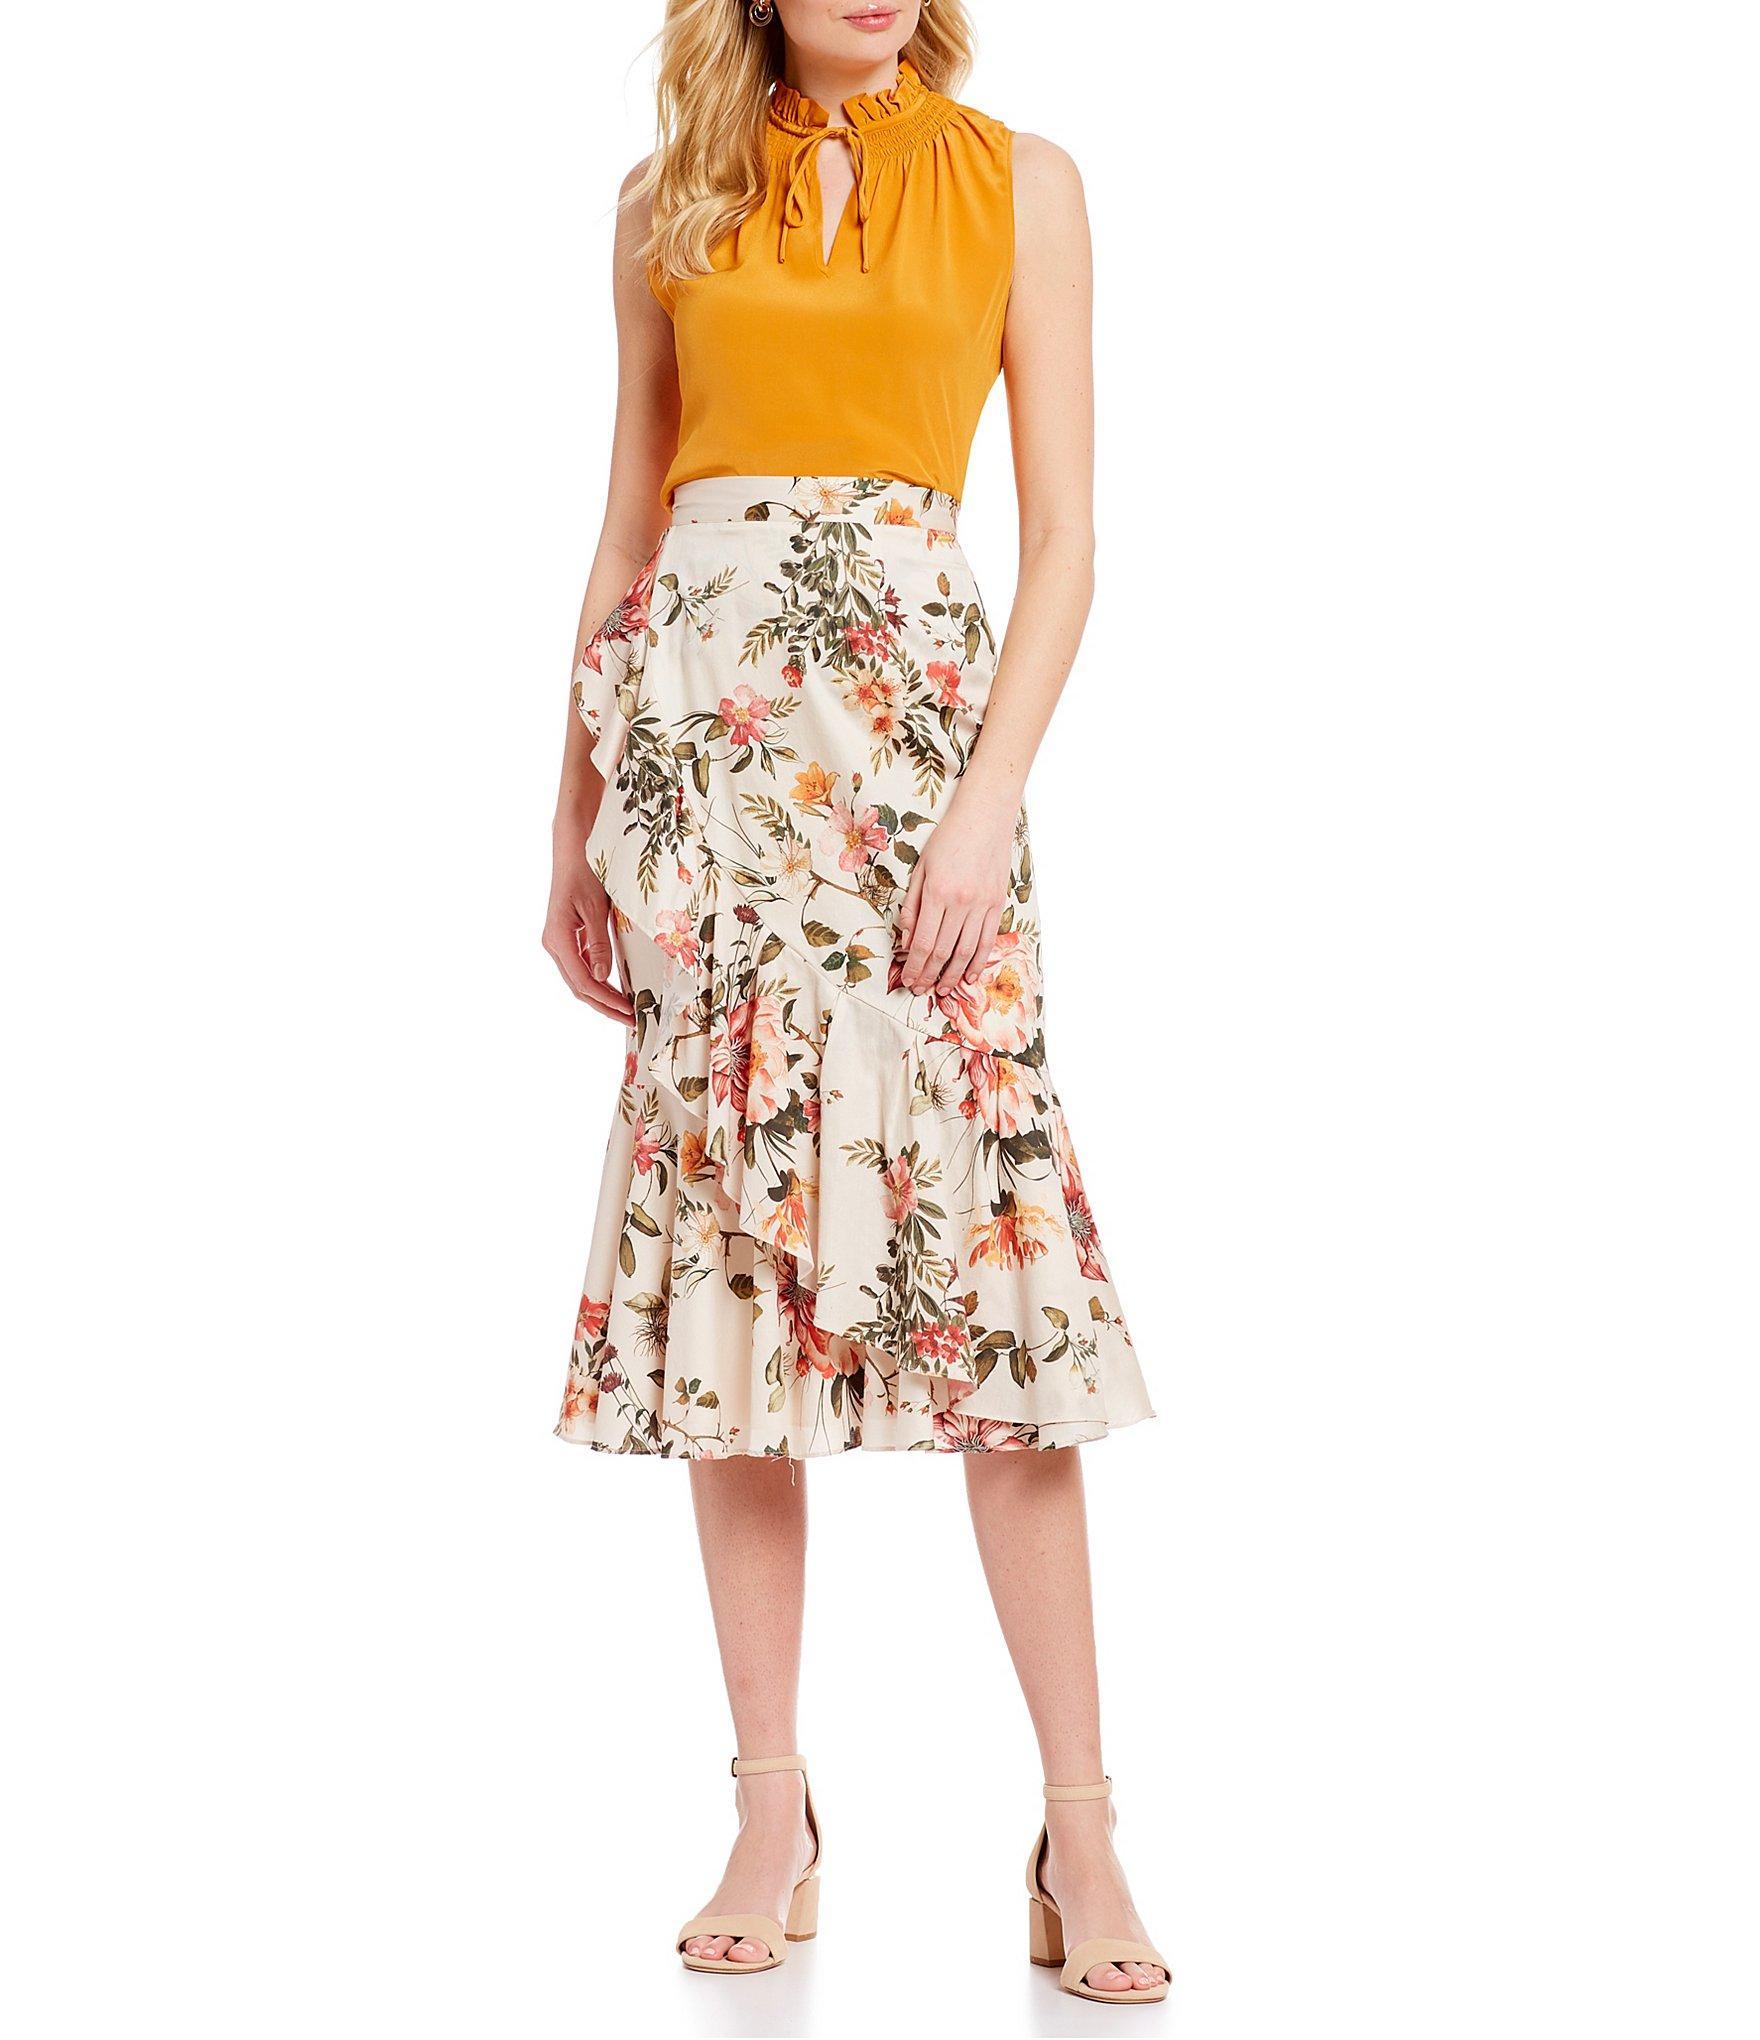 bf2fd354eb1b1 Antonio Melani - Multicolor Susan Smocked High Ruffle Neck Sleeveless Blouse  - Lyst. View fullscreen